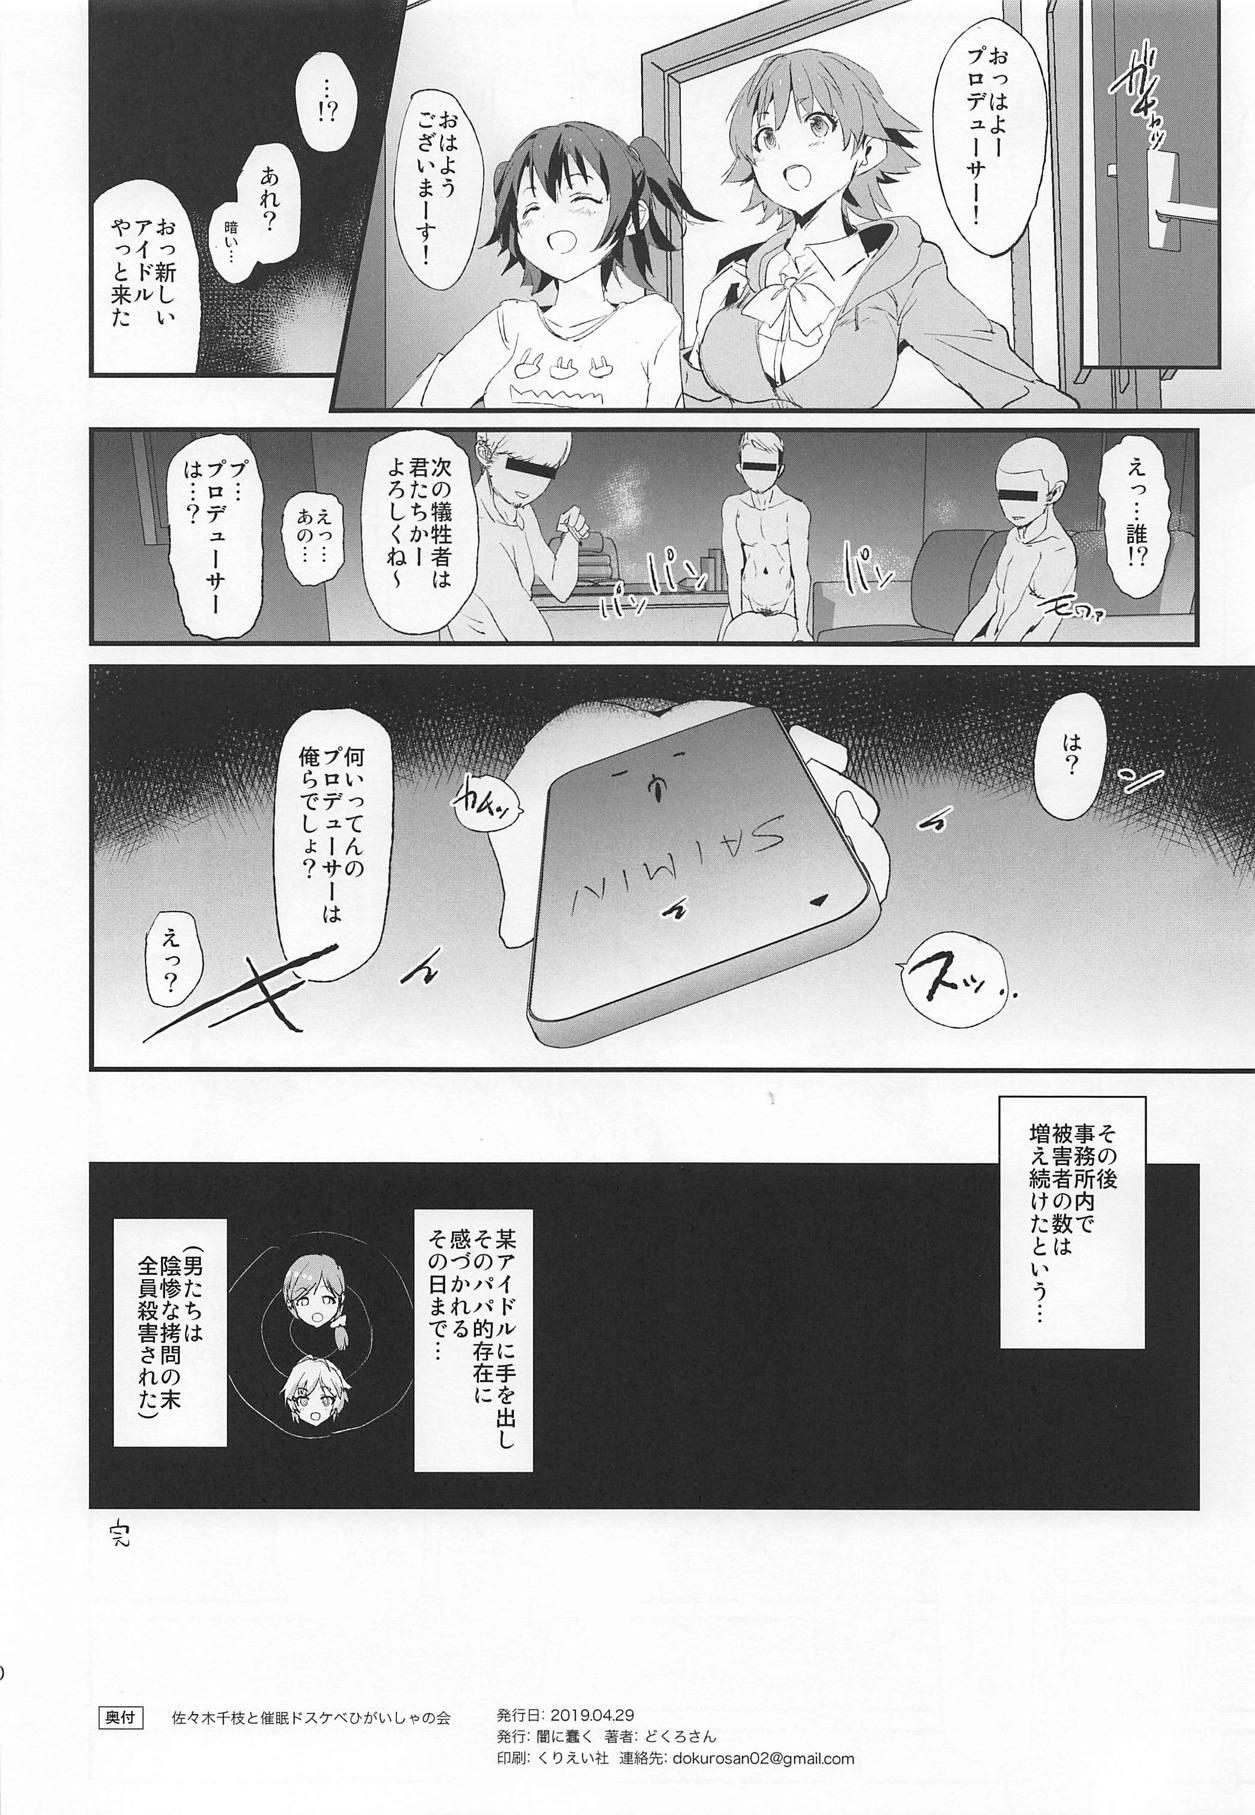 Sasaki Chie to Saimin Dosukebe Higaisha no Kai 18